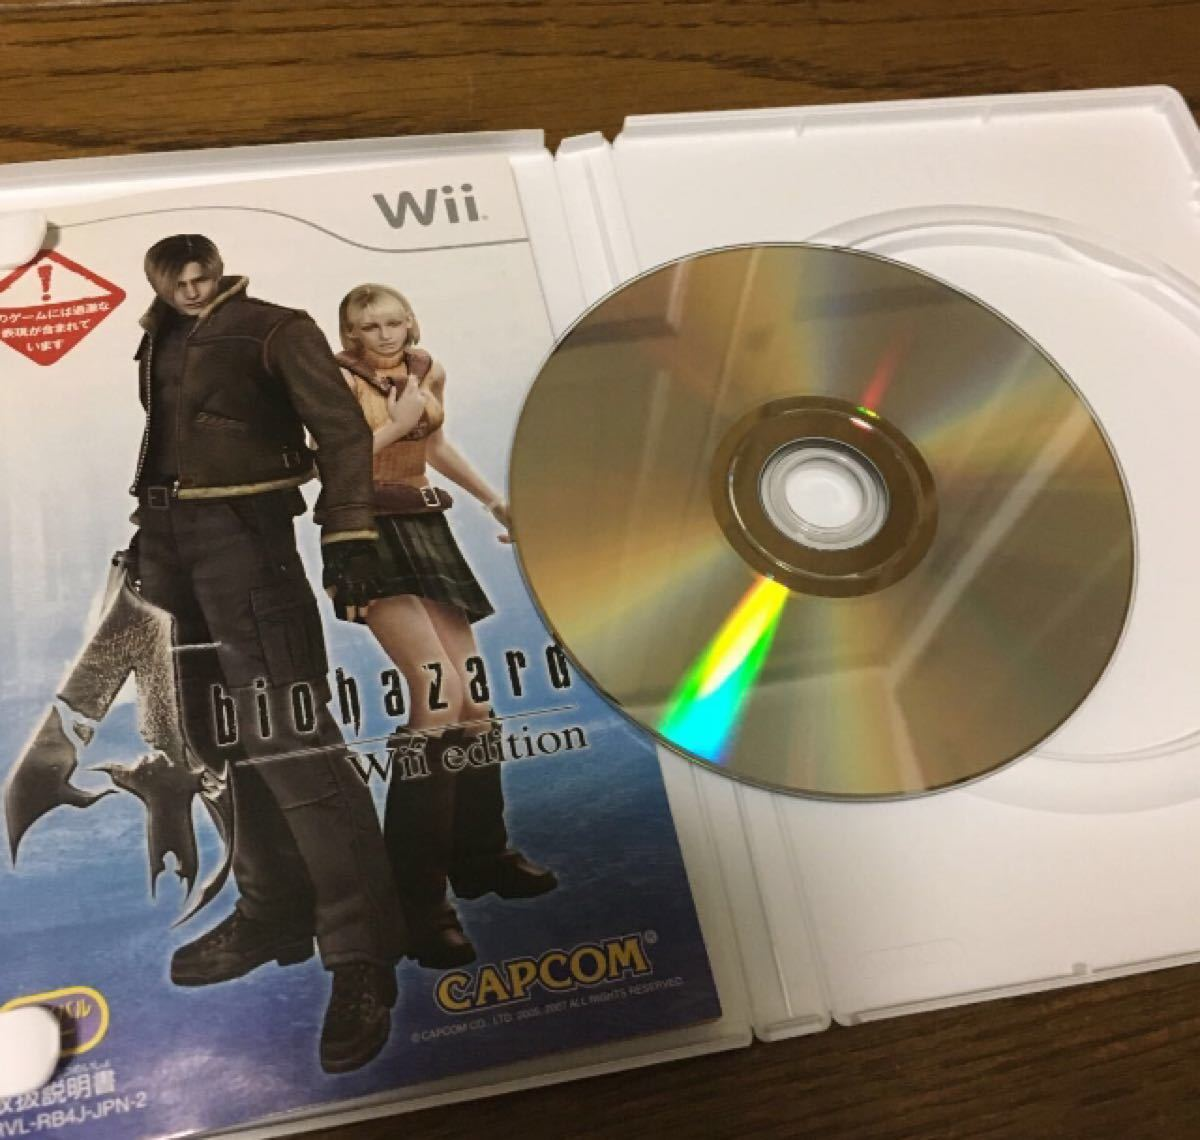 Wii ソフト バイオハザード Wii edition & 風来のシレン3